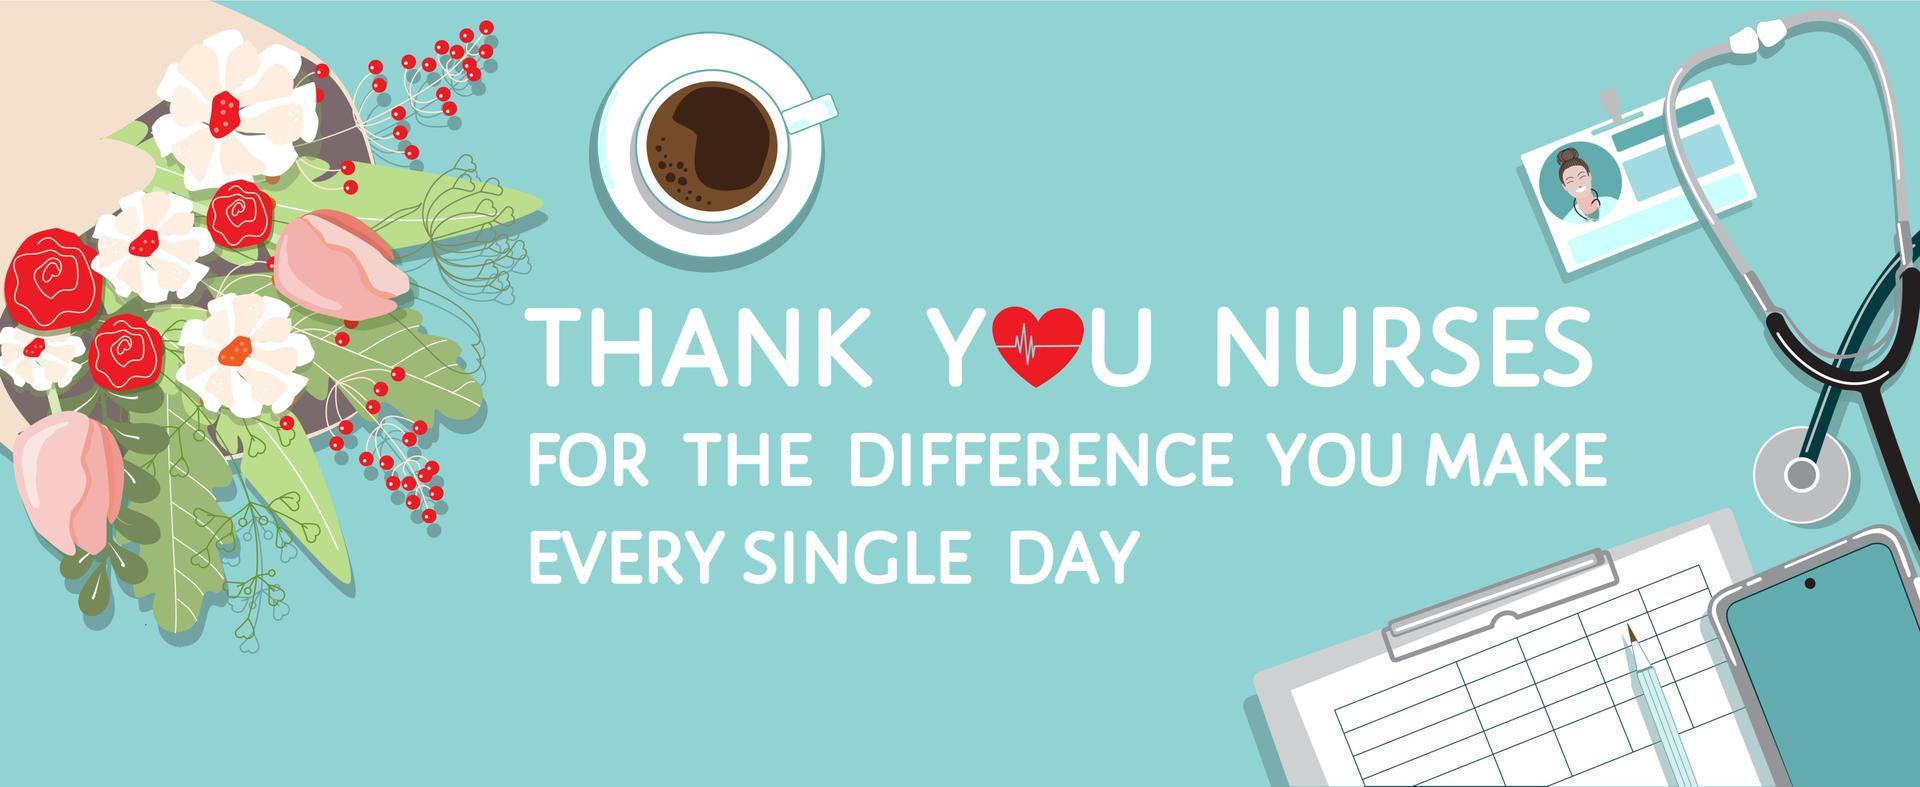 FLowers,badge, clip board Thank you Nurses